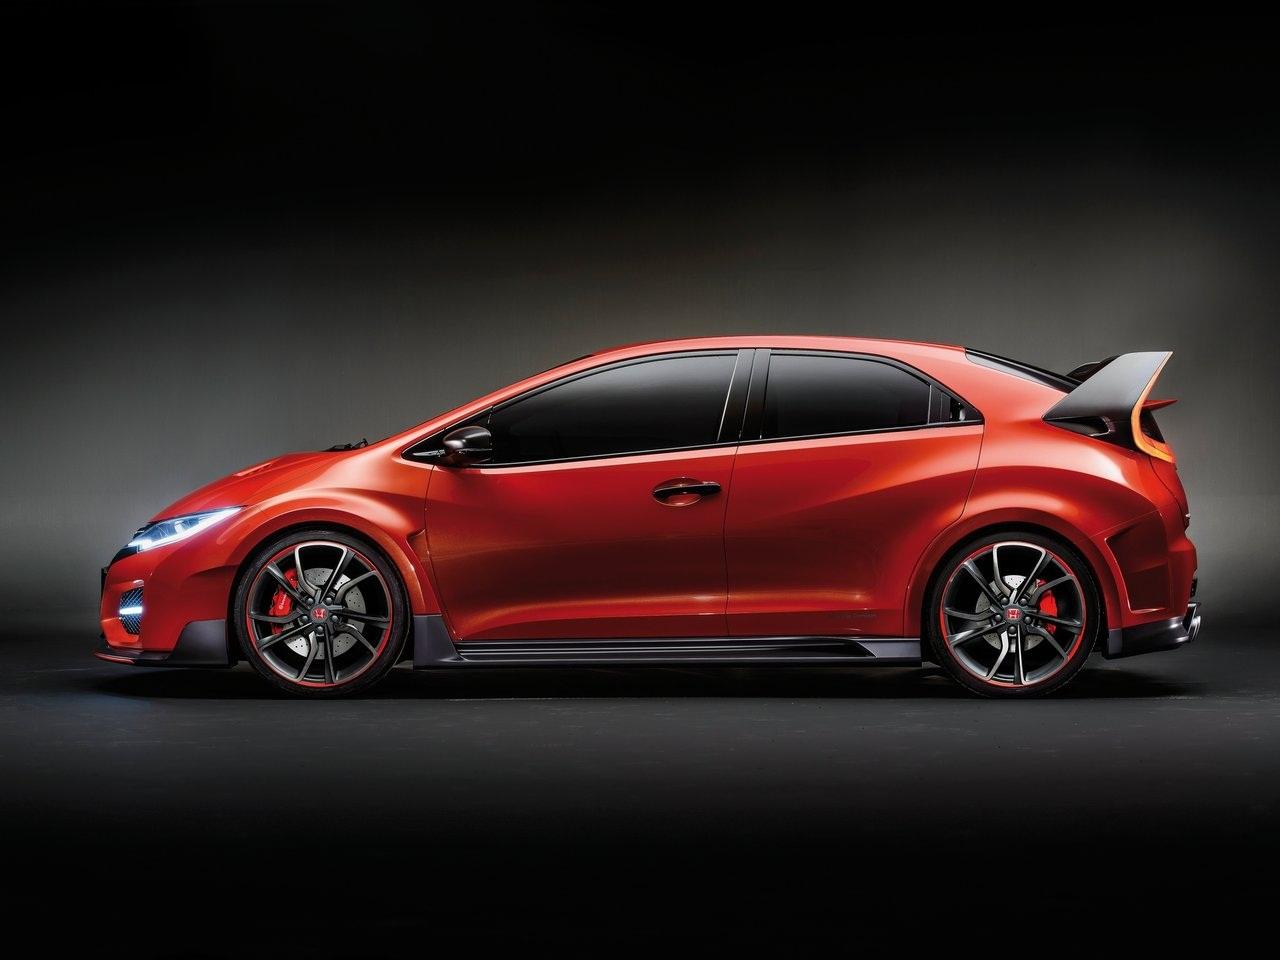 2014 Honda Civic Type R Concept   Wallpapers Pics 1280x960